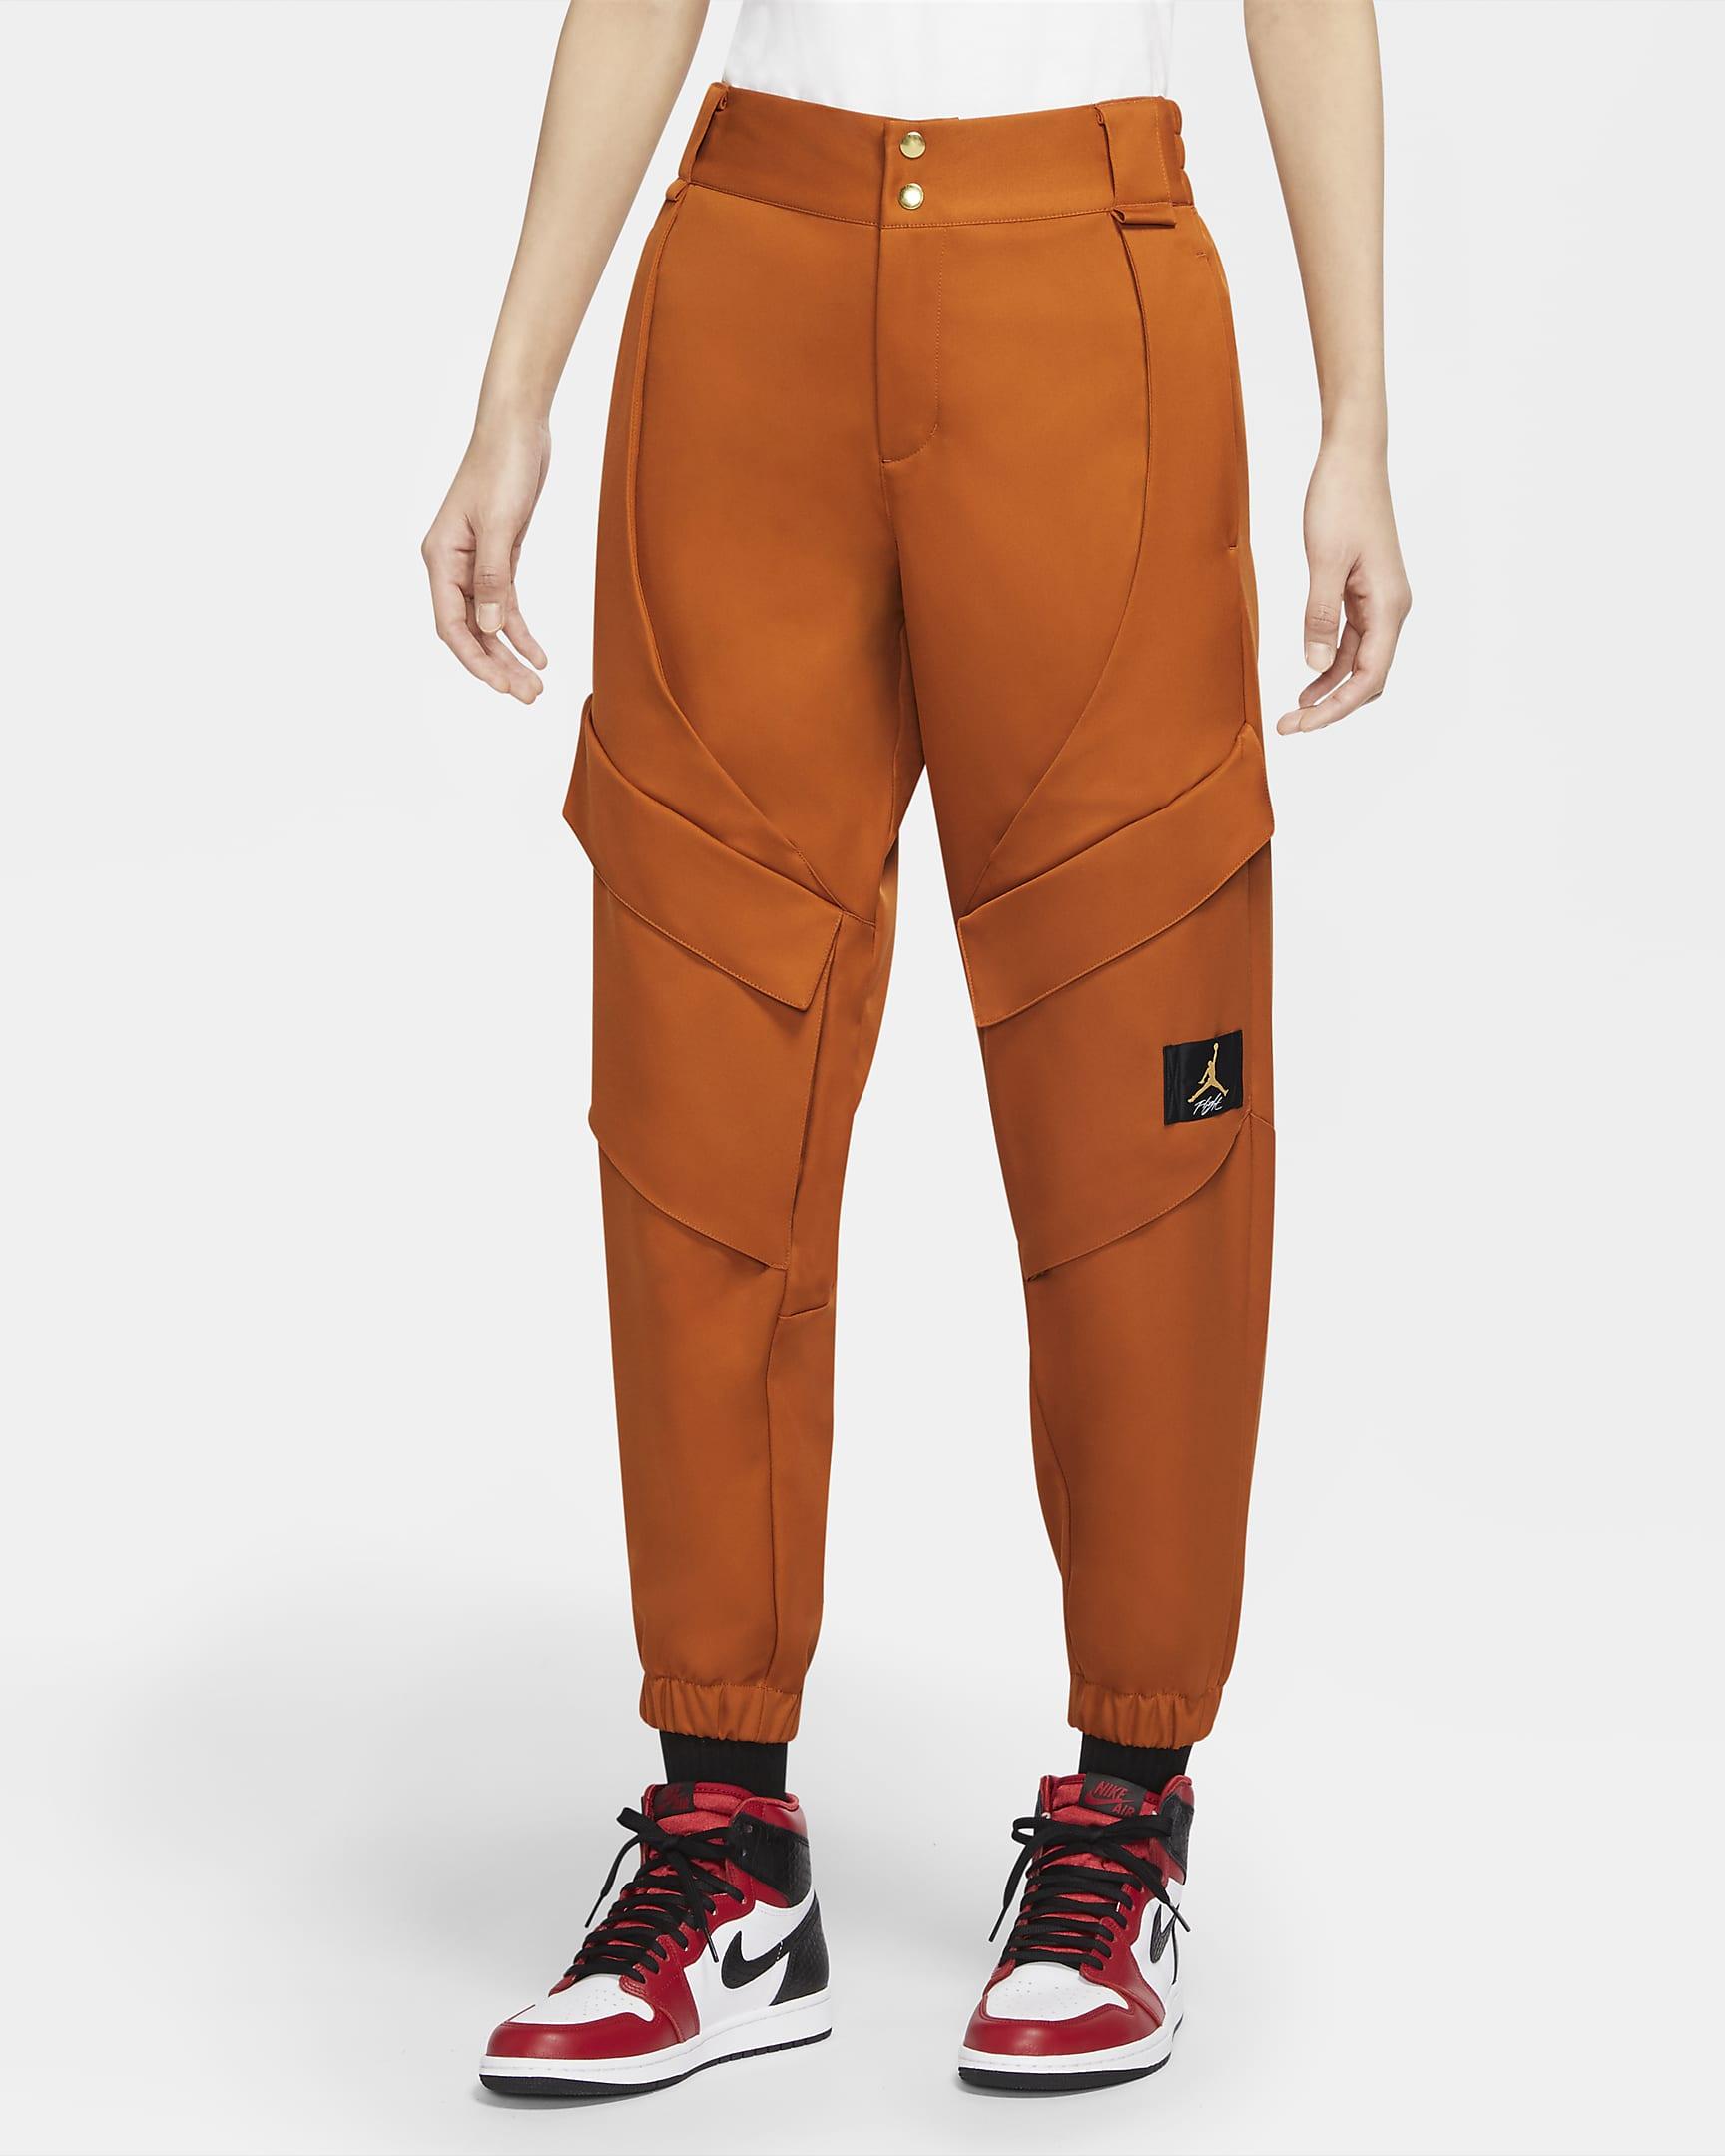 jordan-essentials-womens-utility-pants-nRqDZ8